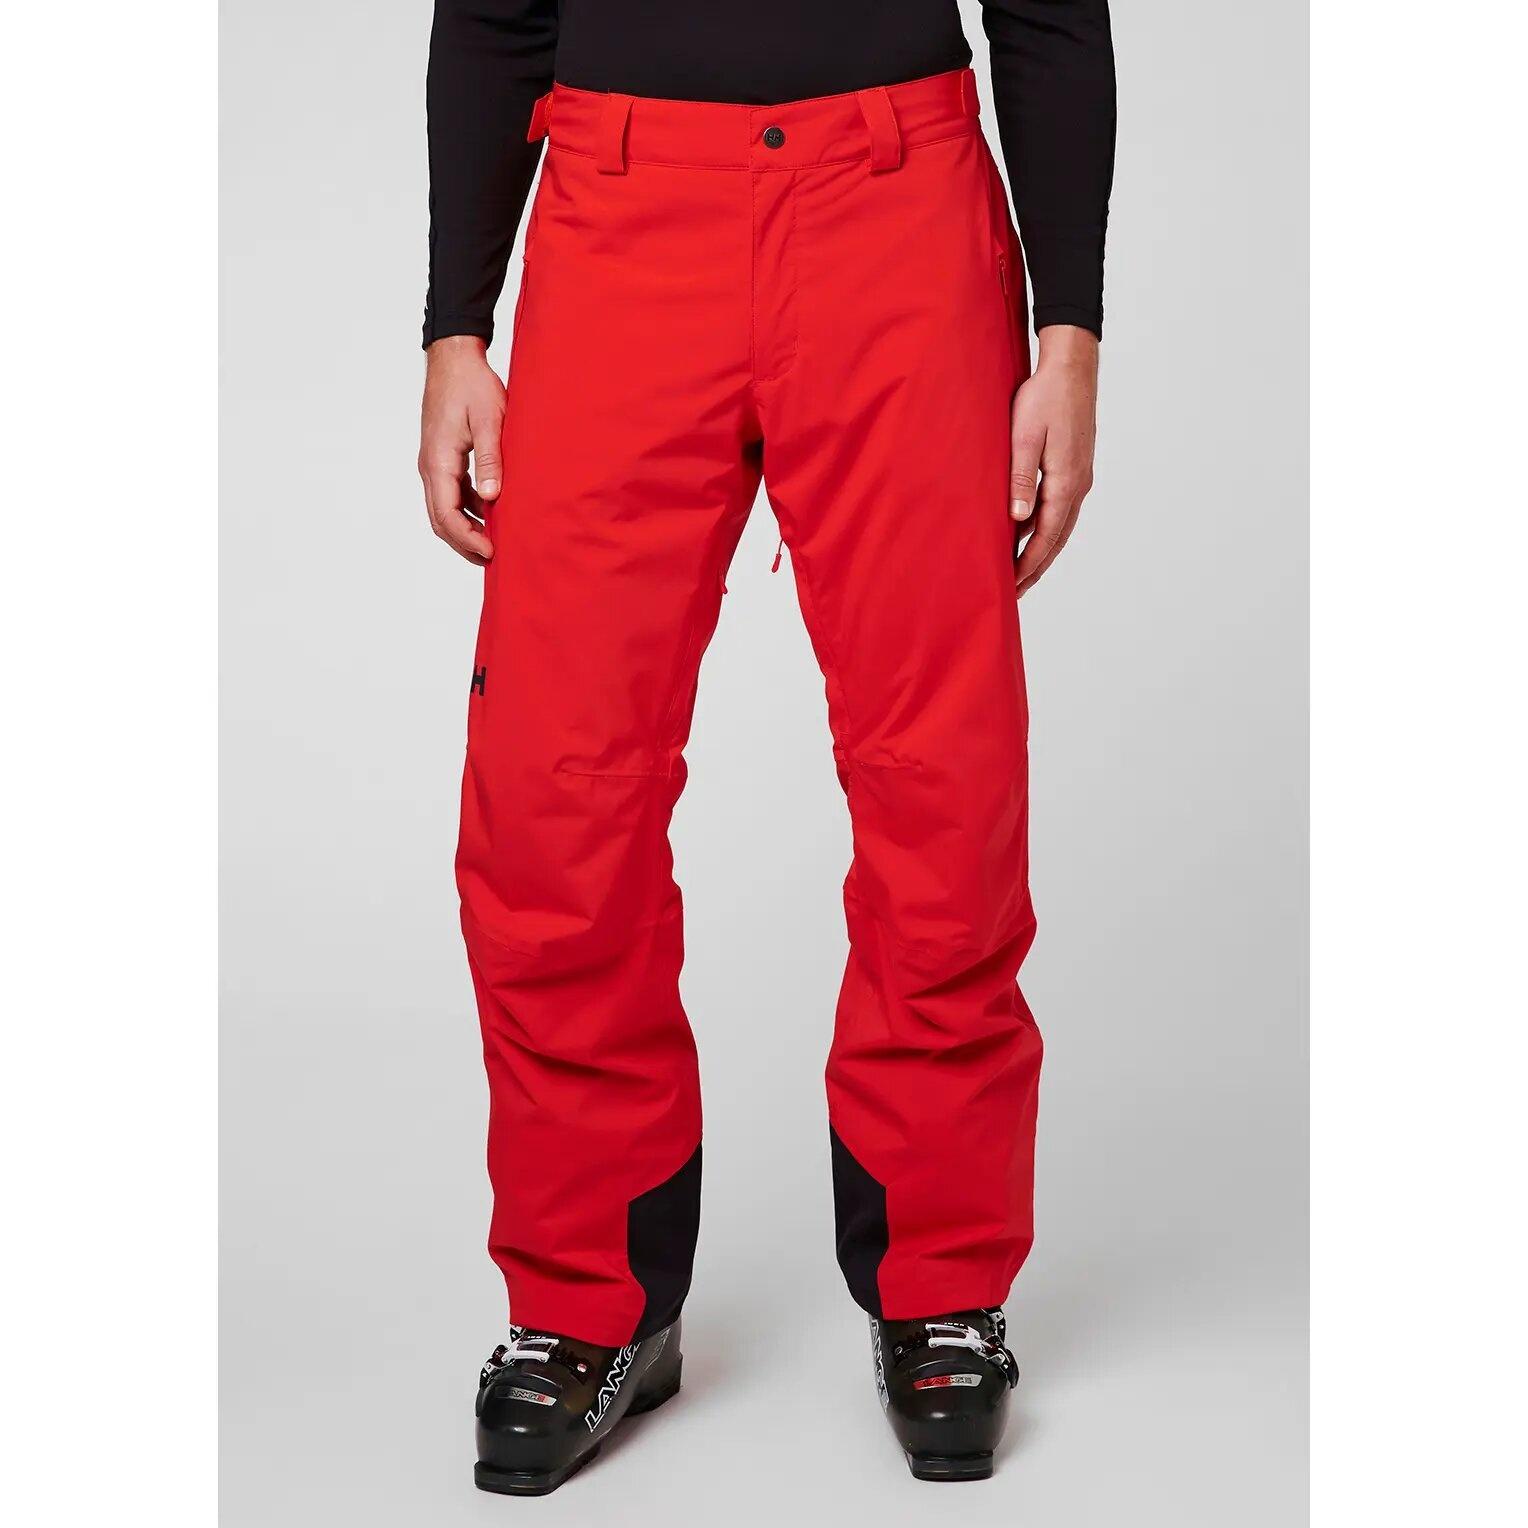 Helly Hansen Legendary Insulated Pant, Alert Red